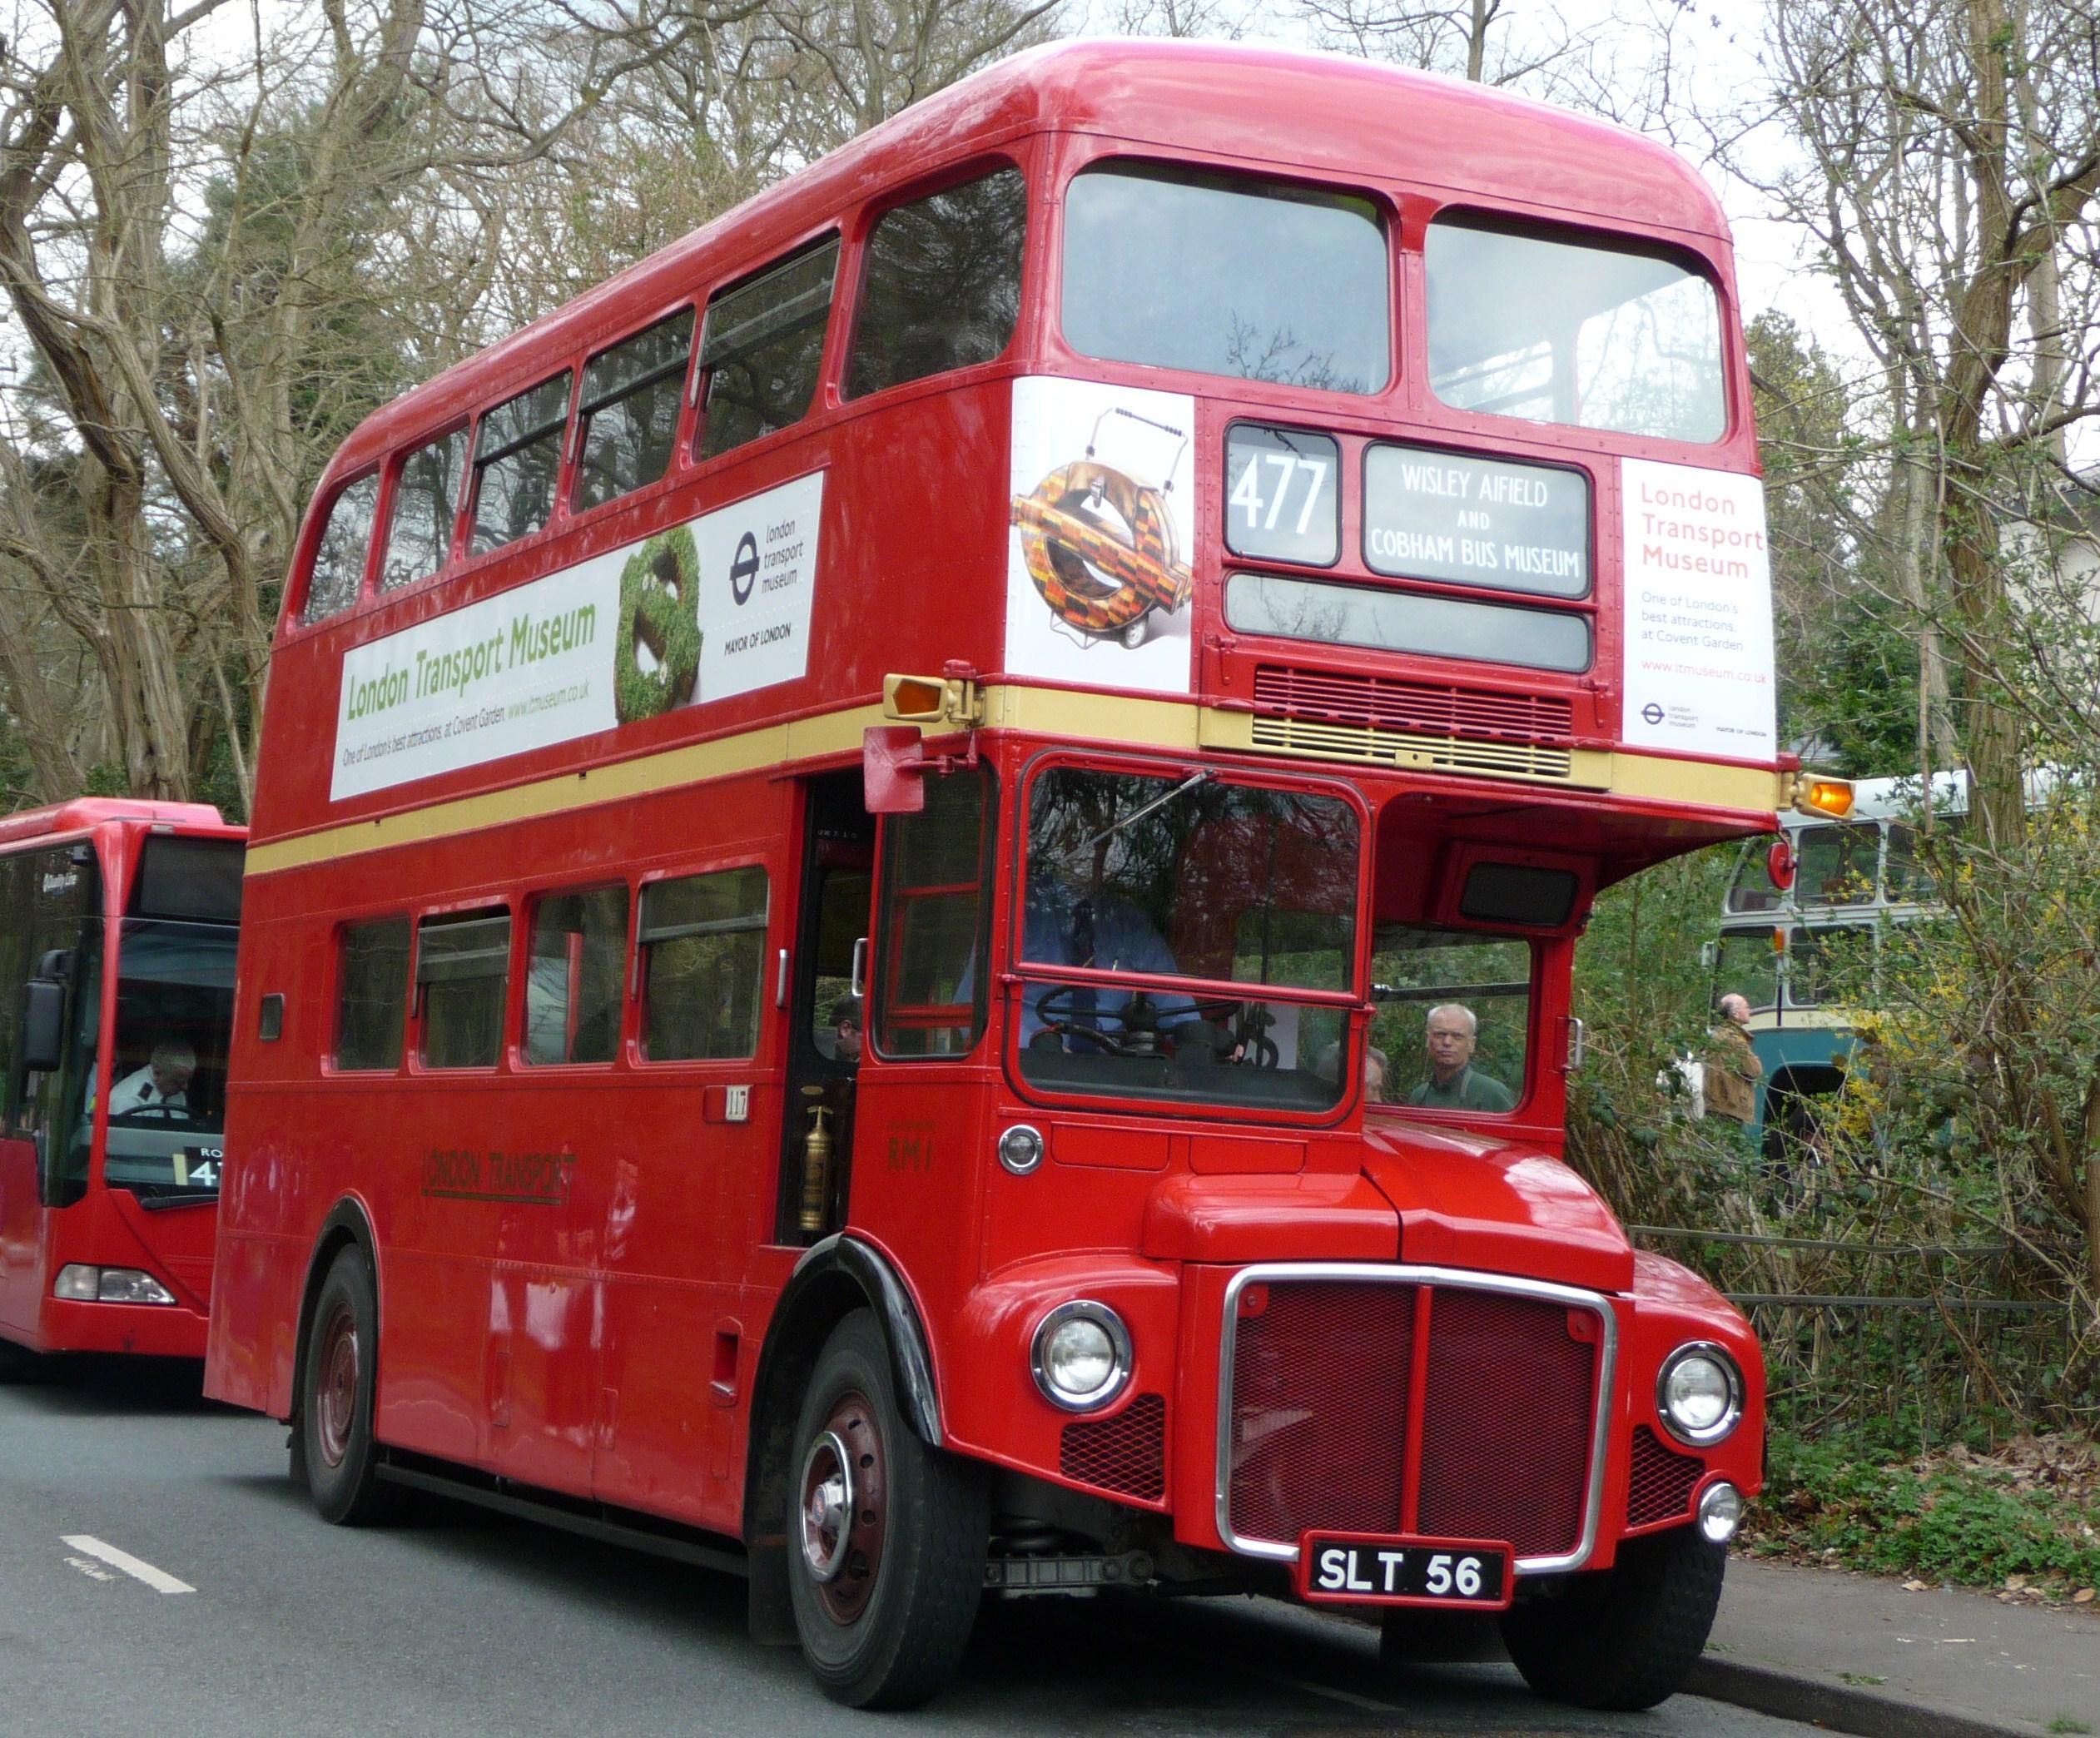 London Transport Logos 2 - Picture of London Transport Museum ...